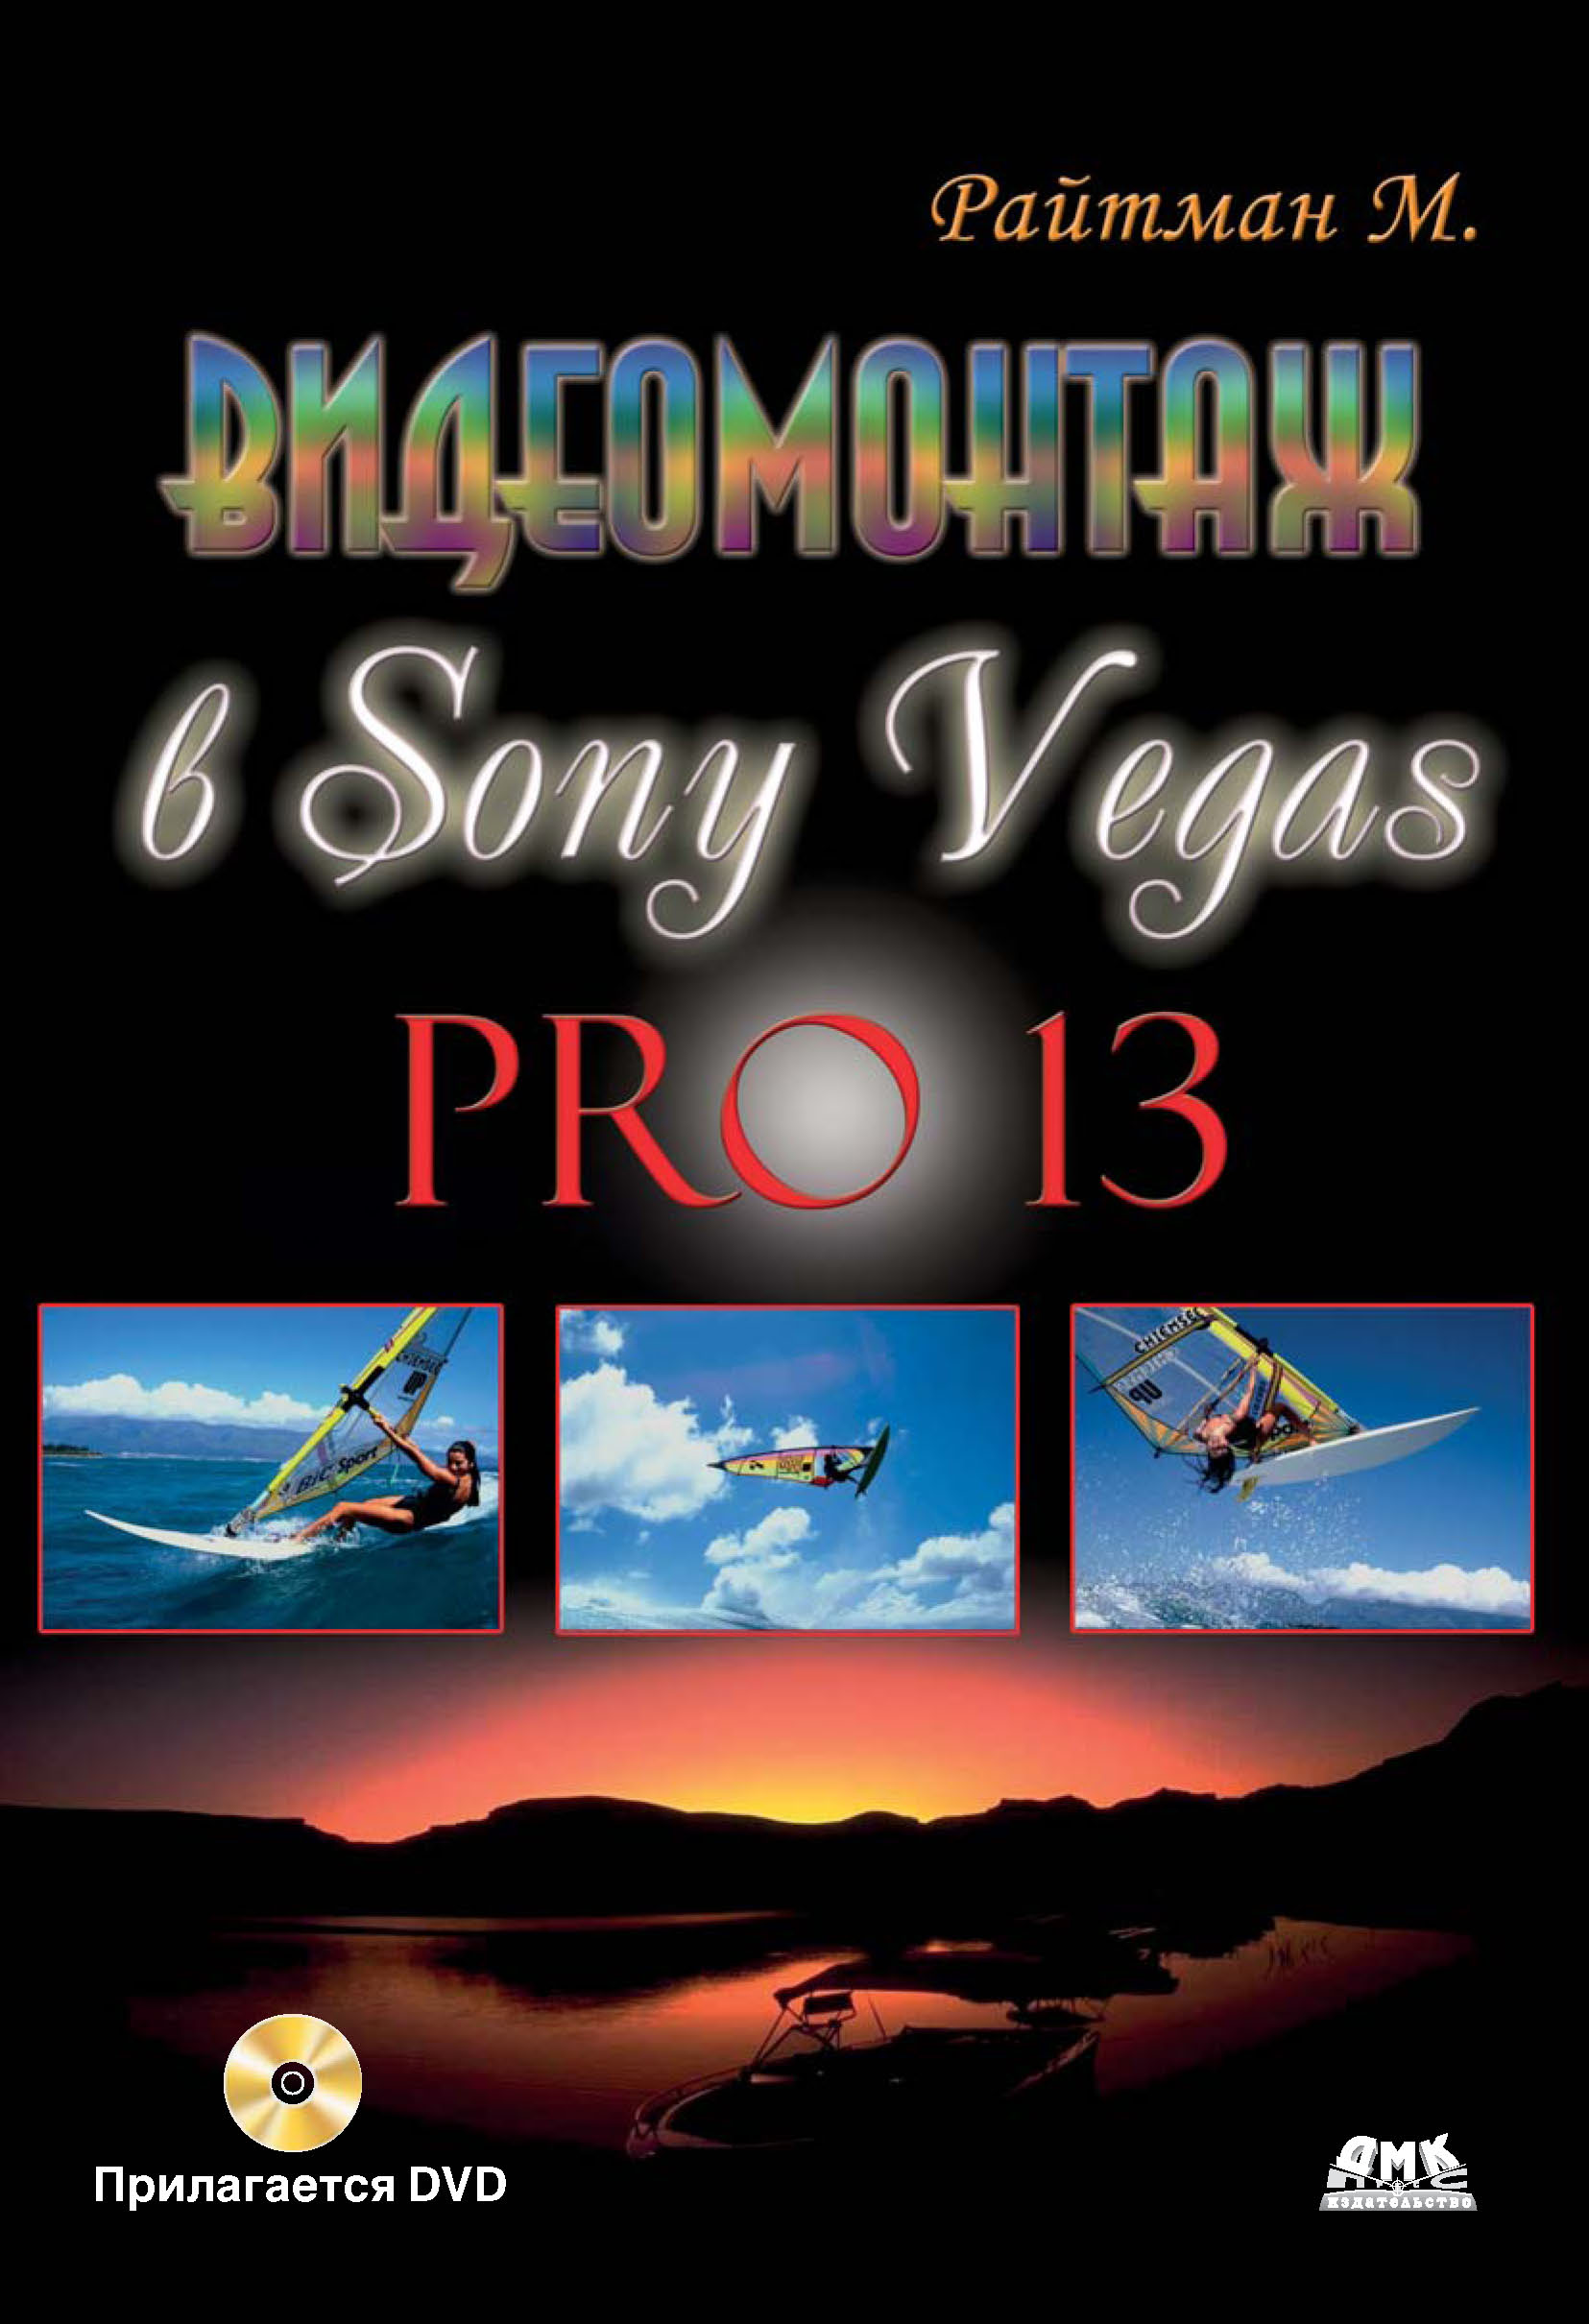 Видеомонтаж в Sony Vegas Pro 13